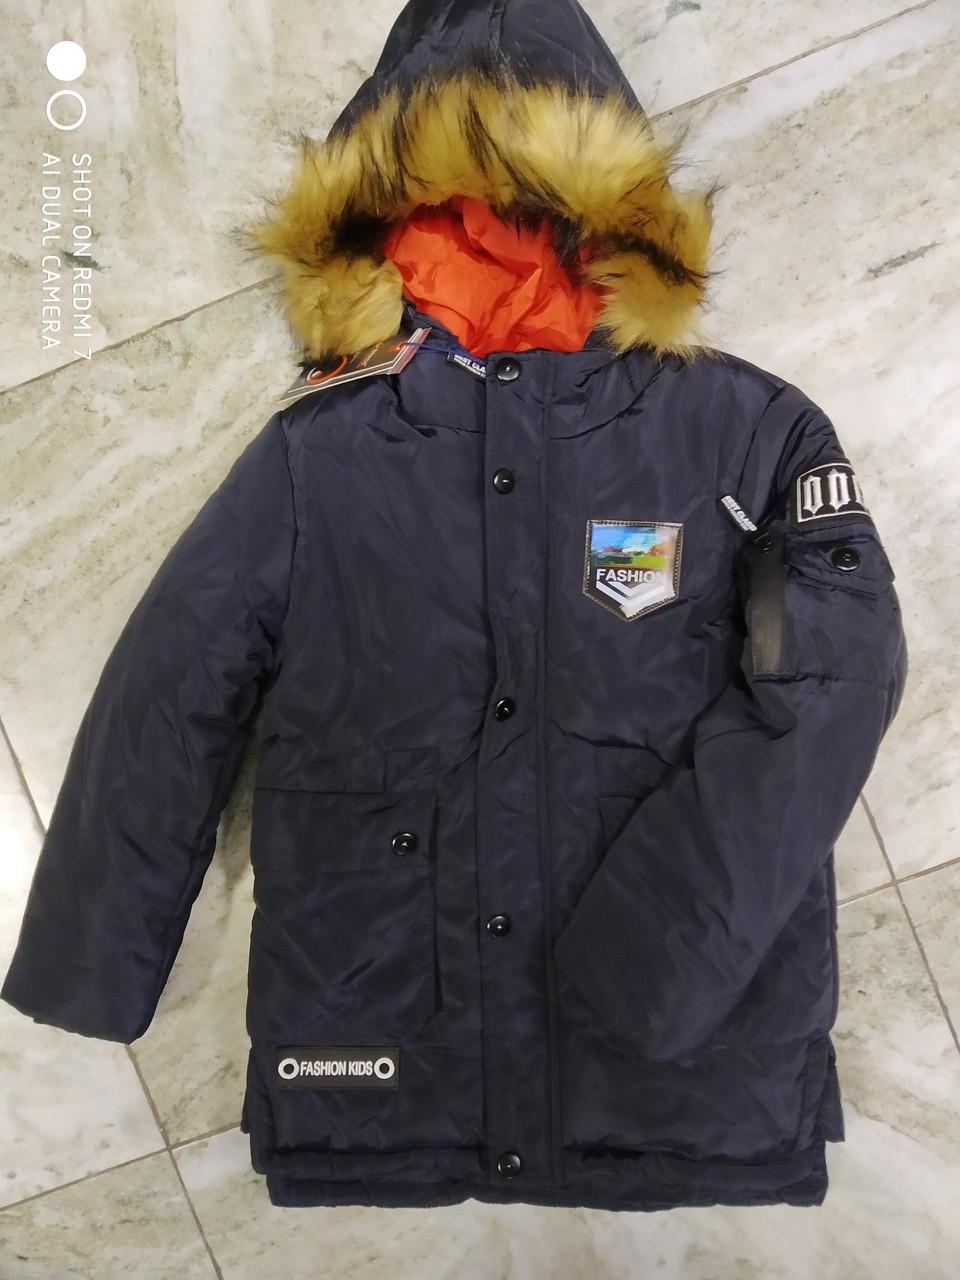 Зимняя куртка  Аляска на мальчика цвет темно синий  140-146 см